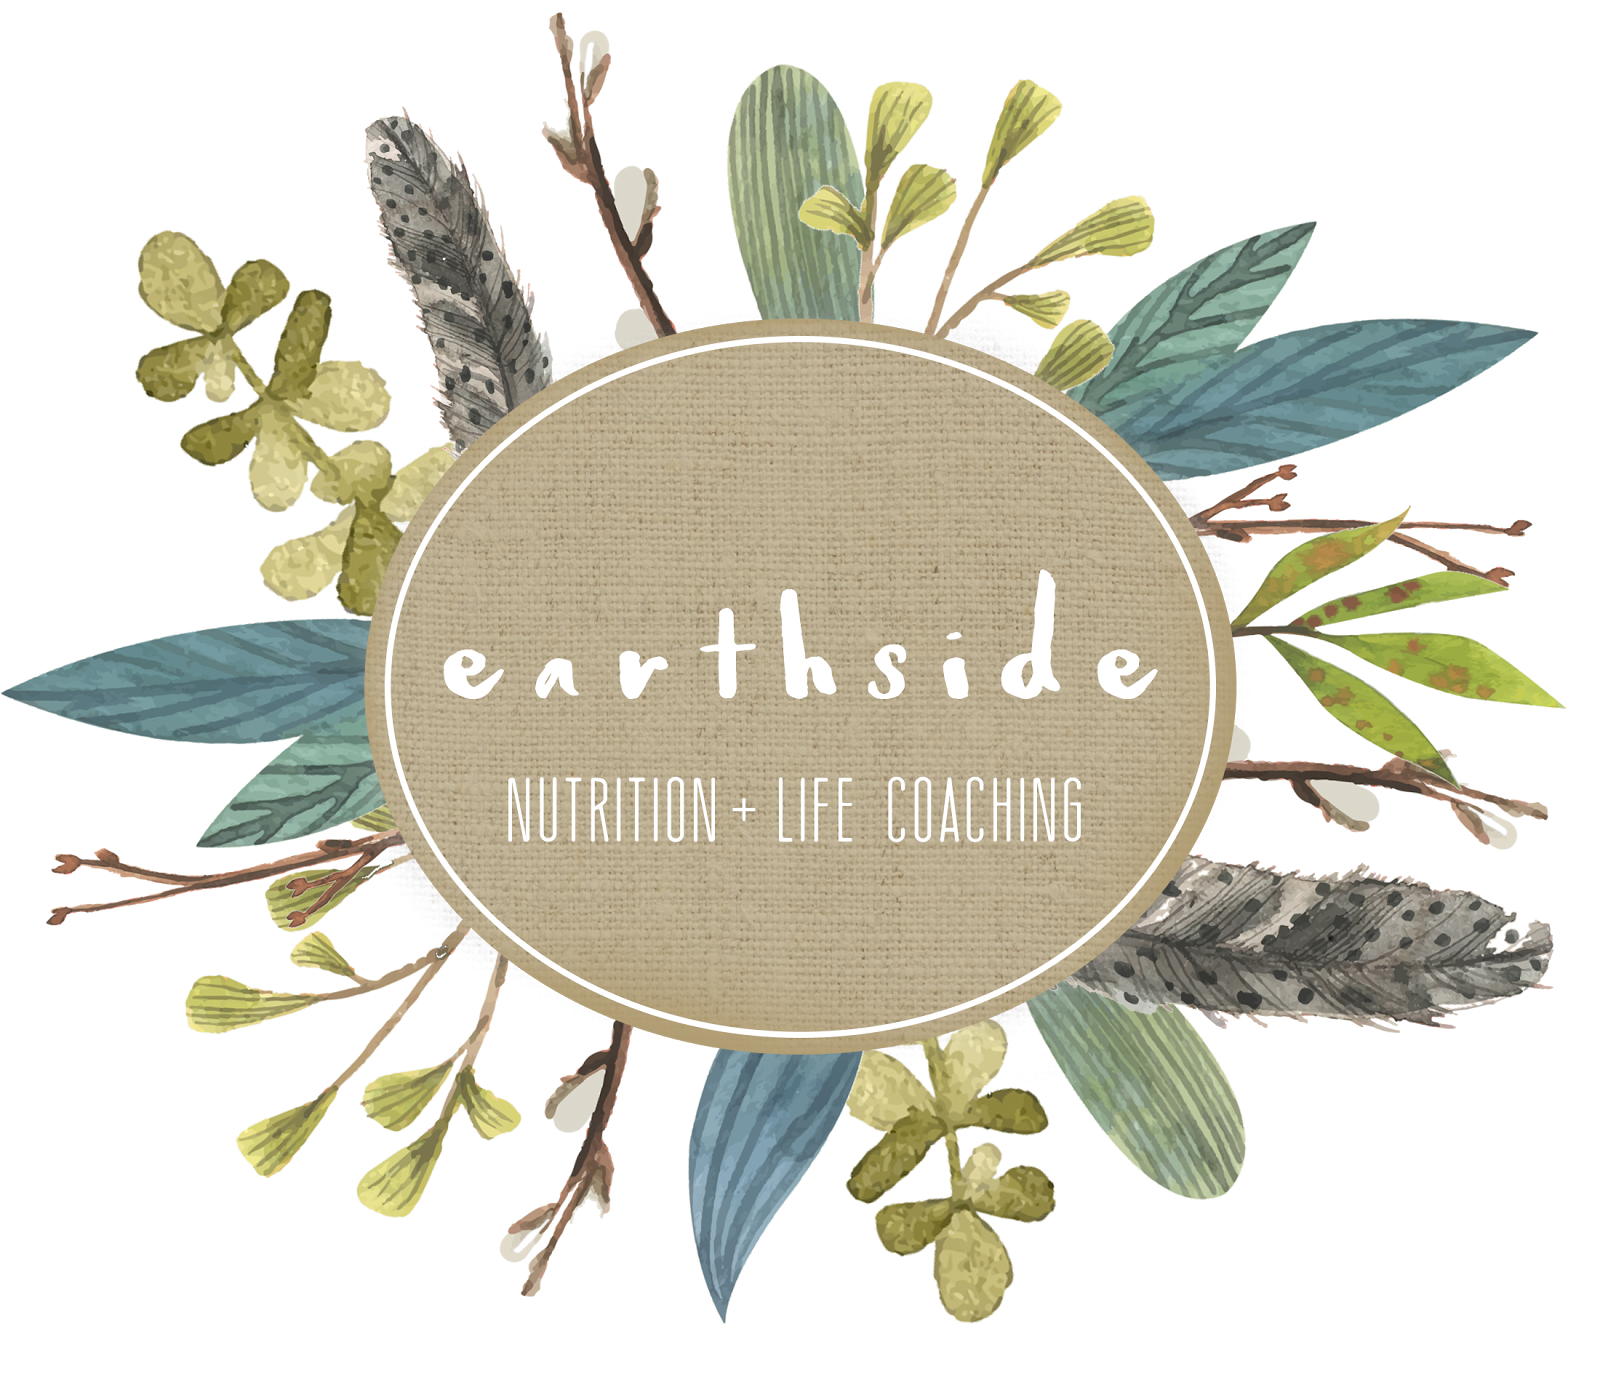 earthside